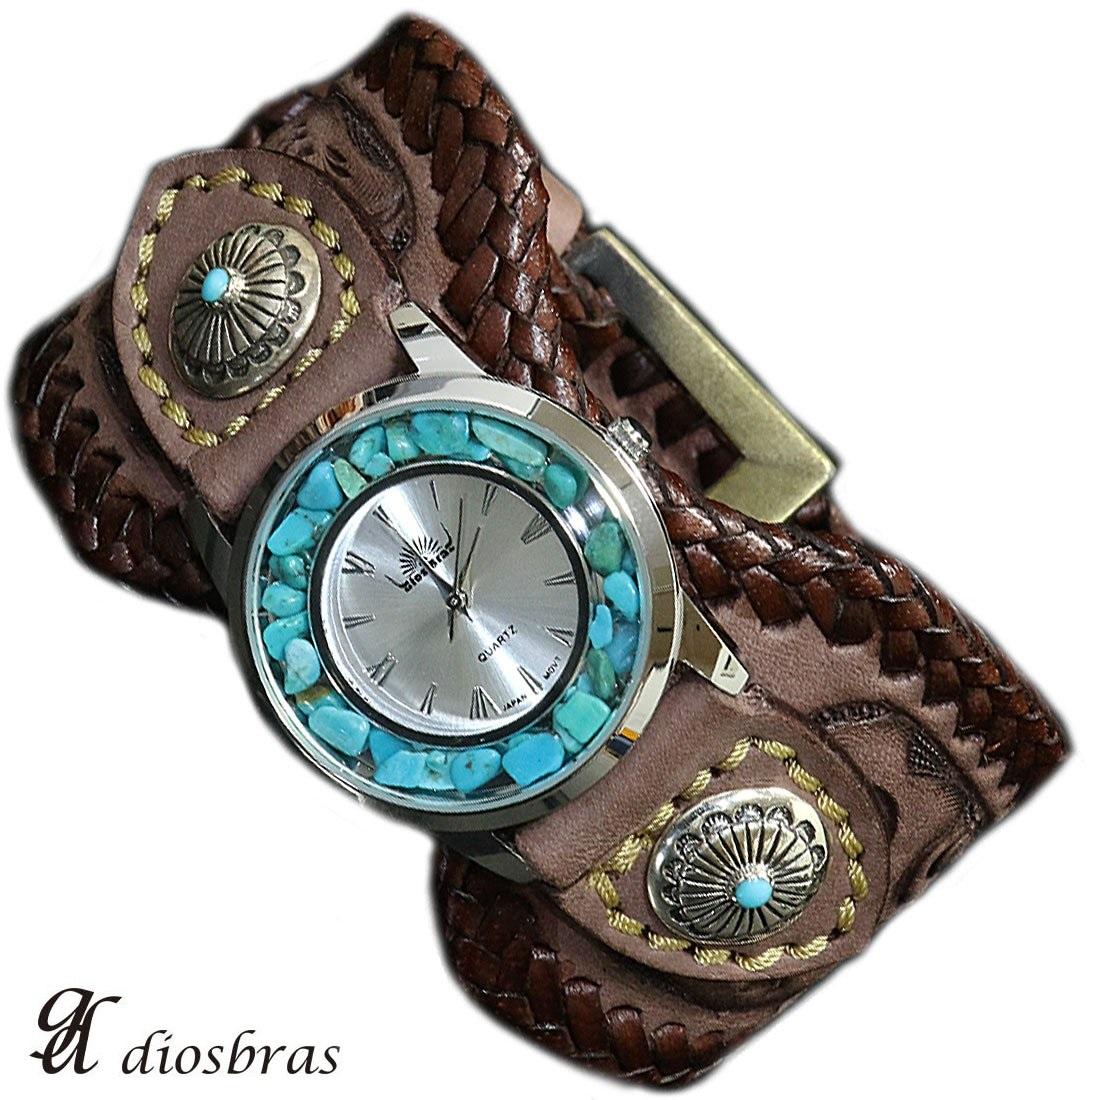 【diosbras-ディオブラス-】本革サドルレザー手彫りカービング カスタムウォッチ レザーウォッチ コンチョ 腕時計 シルバー925 ヌメ革 バイカー 牛革時計 インディアン メンズ ベルト ブラウン 茶